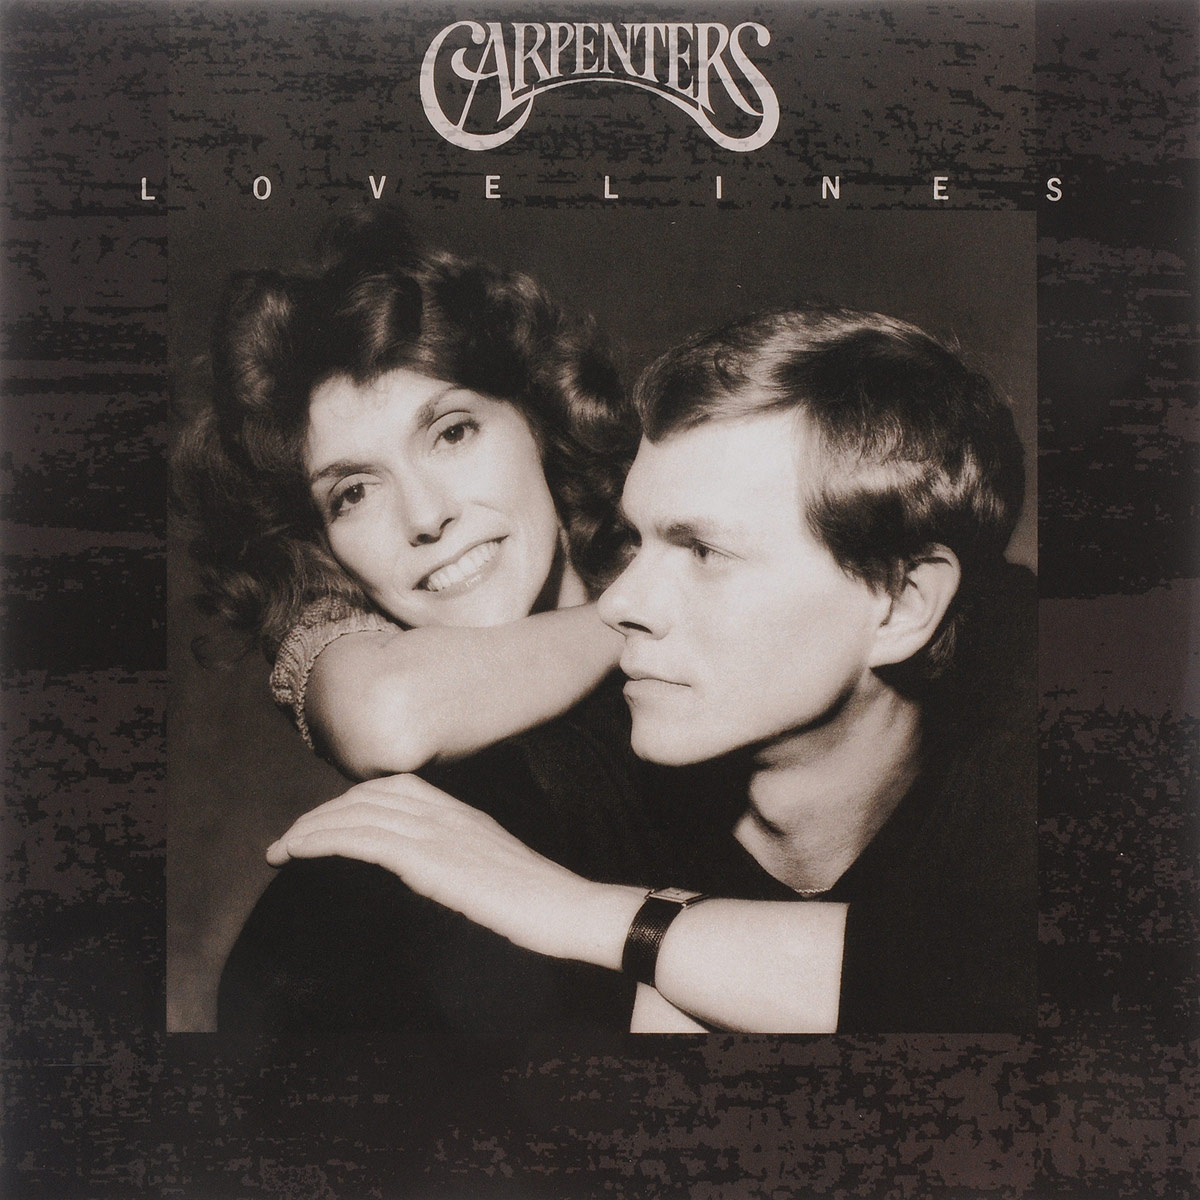 The Carpenters Carpenters. Lovelines (LP) the carpenters carpenters passage